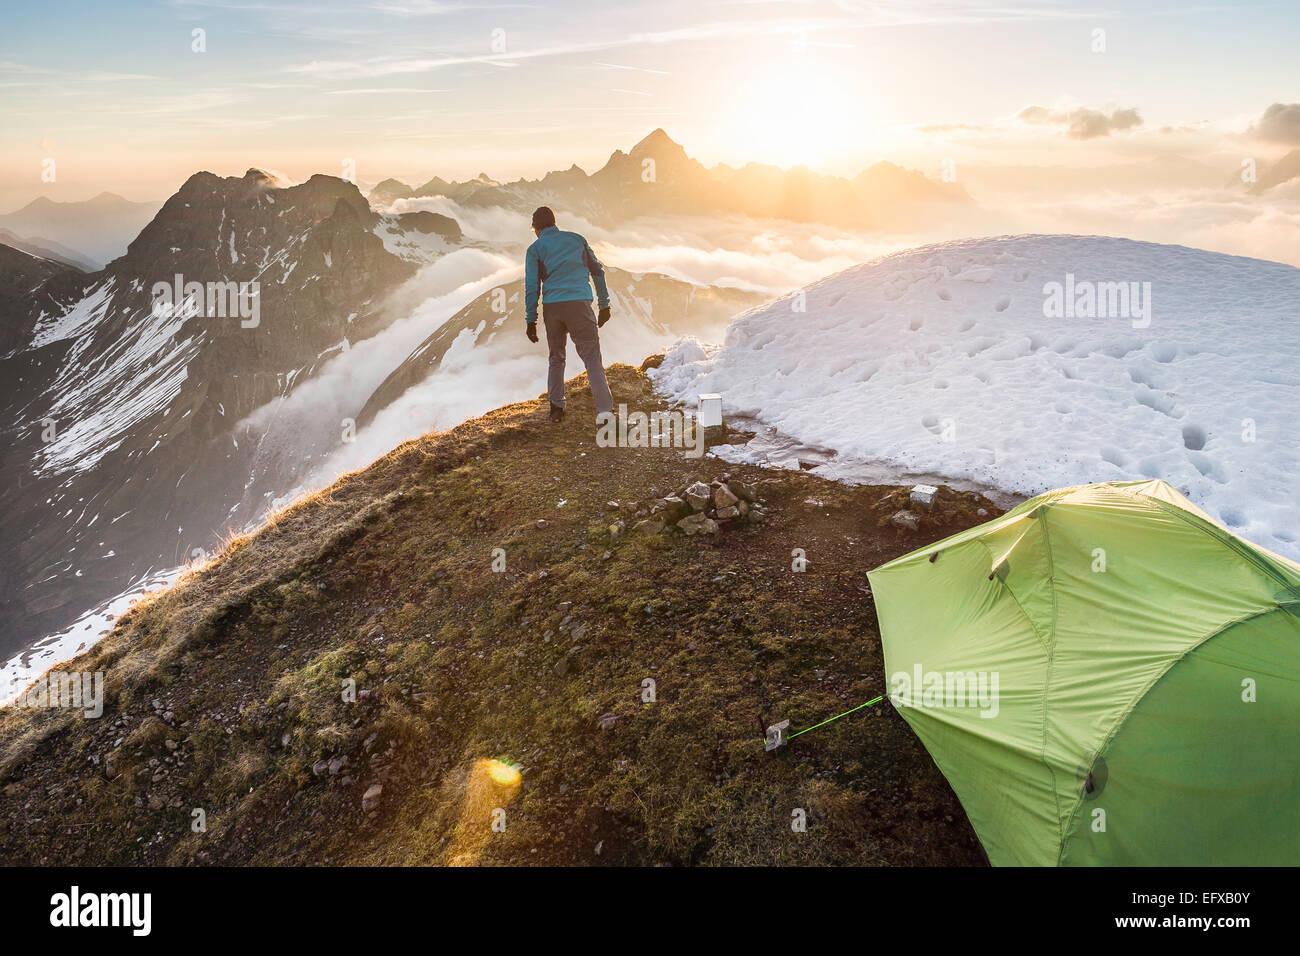 Giovane maschio camper guardando a vista, Alpi Bavaresi, Oberstdorf, Baviera, Germania Foto Stock